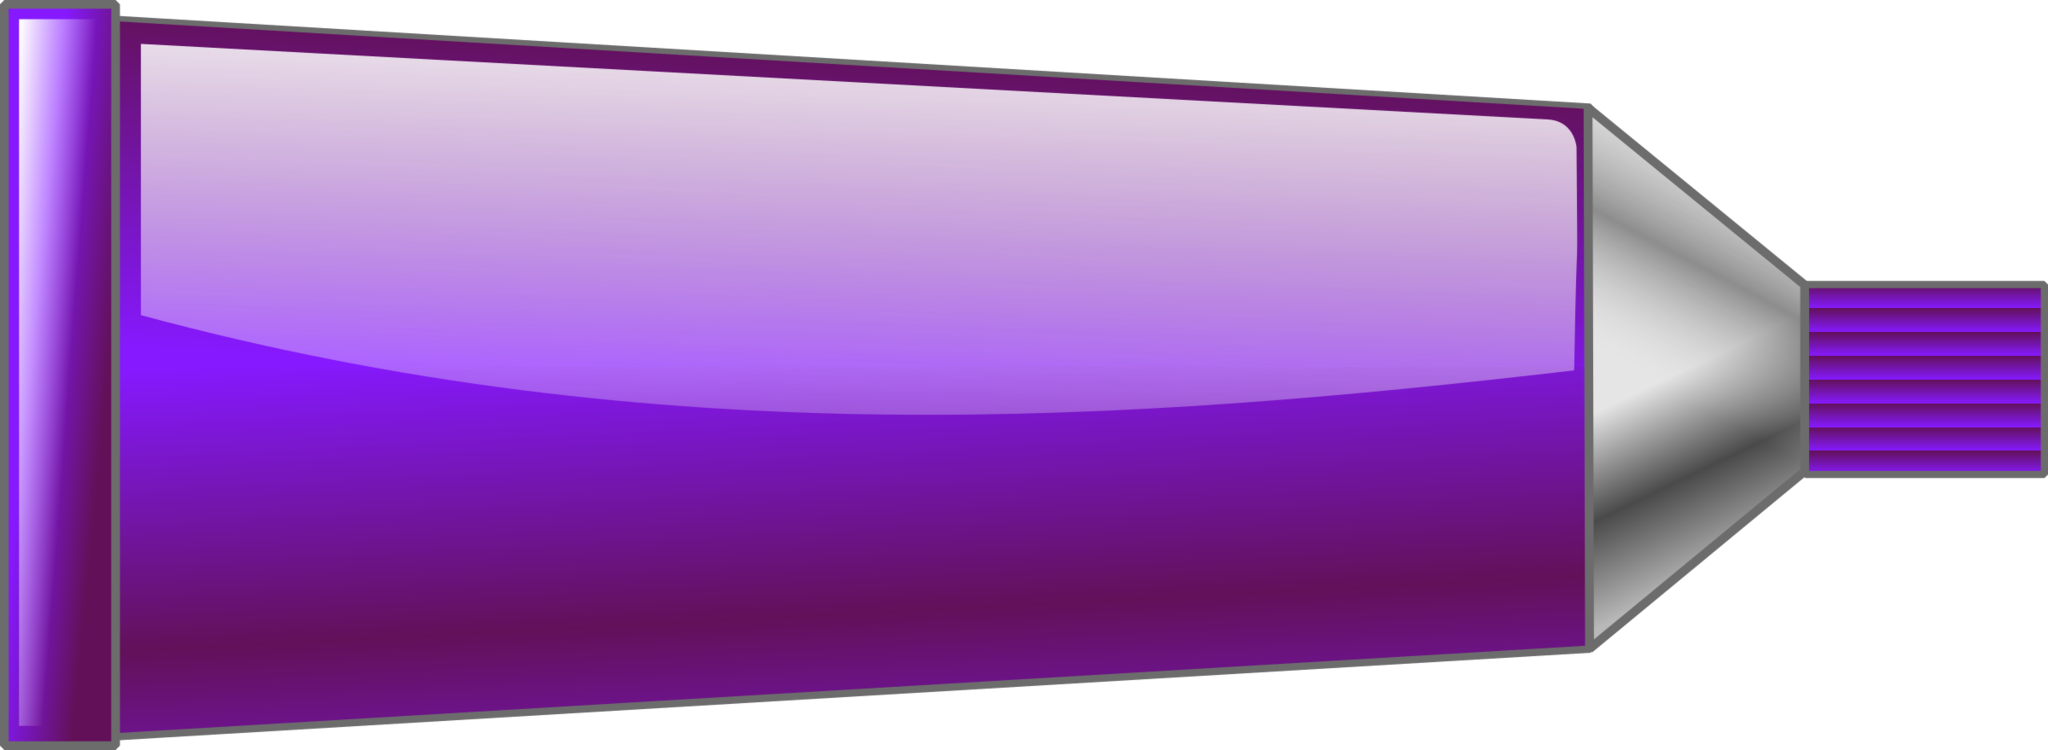 Square,Angle,Purple